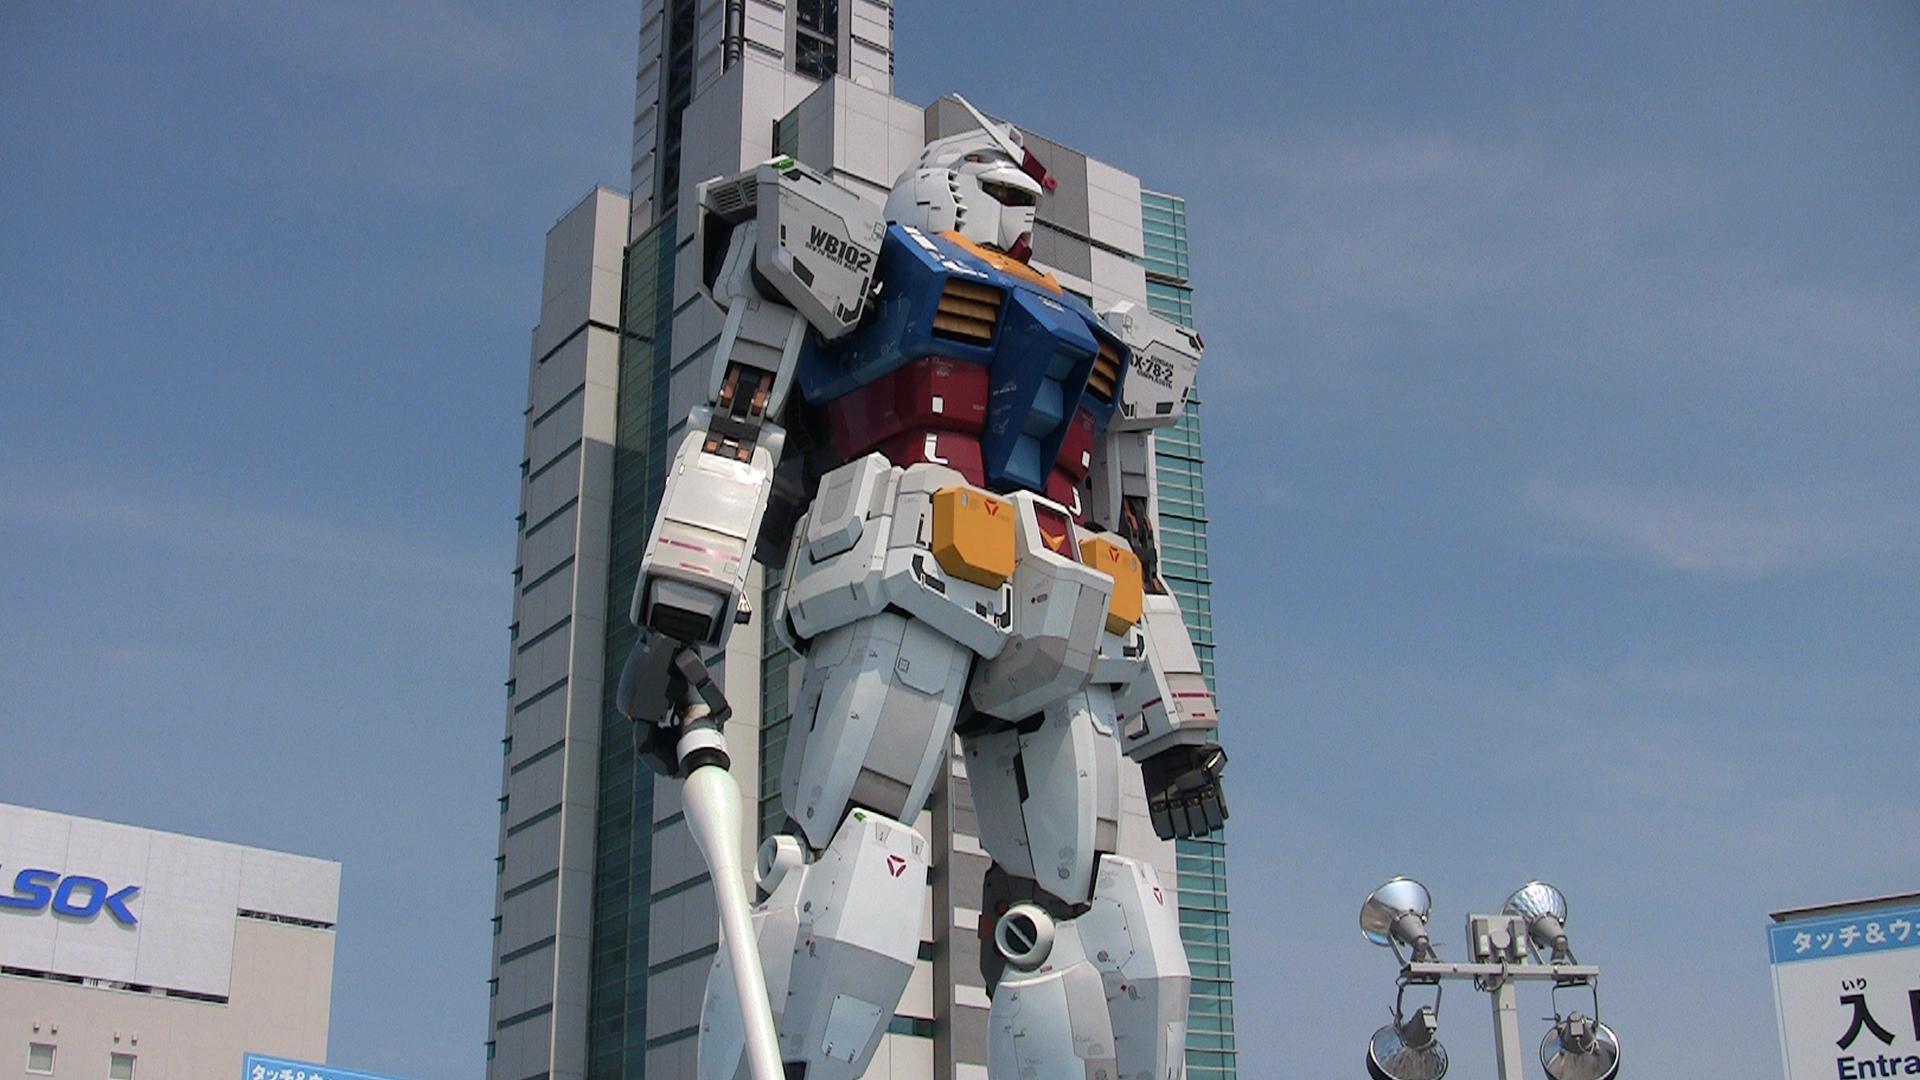 Gundam Mecha Wallpaper 1920x1080 Gundam Mecha 1920x1080